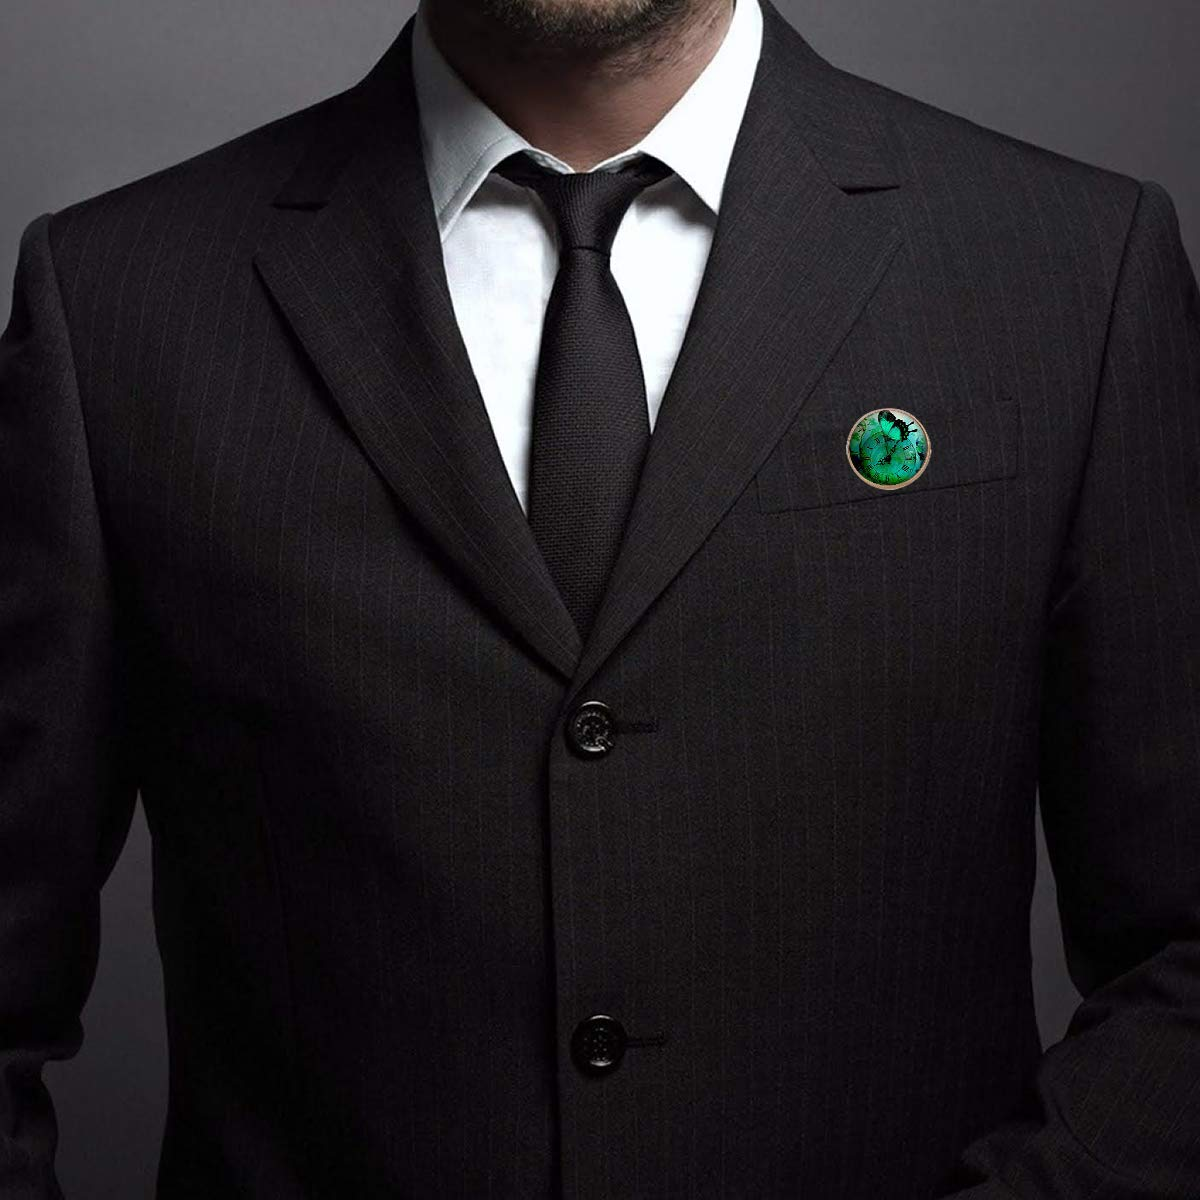 Pinback Buttons Badges Pins Green Butterfly Steampunk Clock Lapel Pin Brooch Clip Trendy Accessory Jacket T-Shirt Bag Hat Shoe